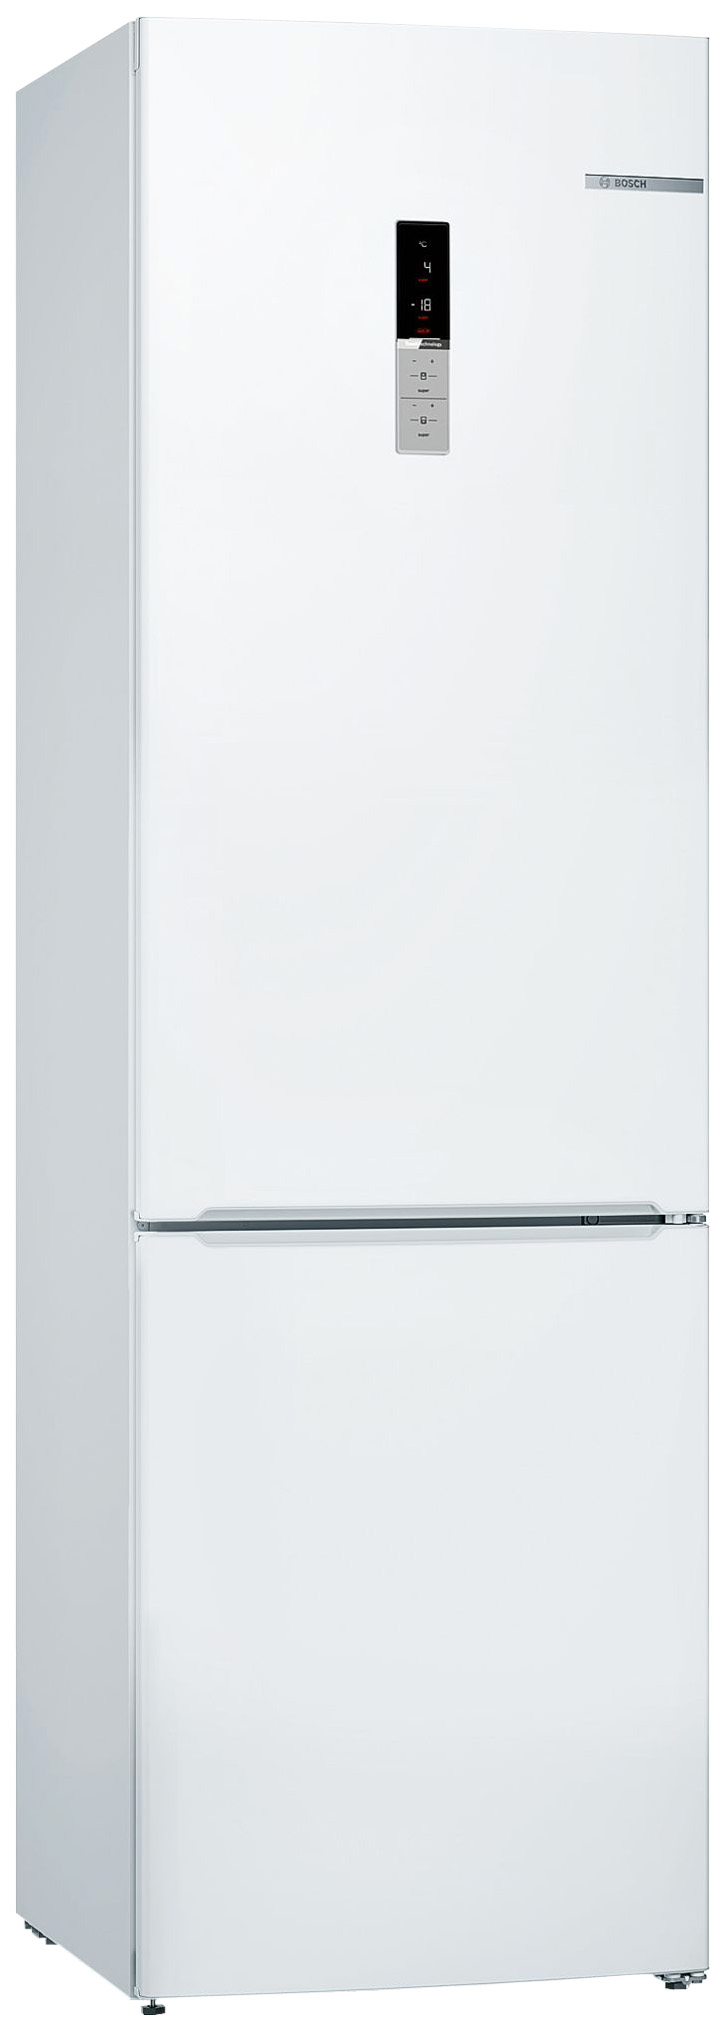 Холодильник Bosch KGE39XW2AR White